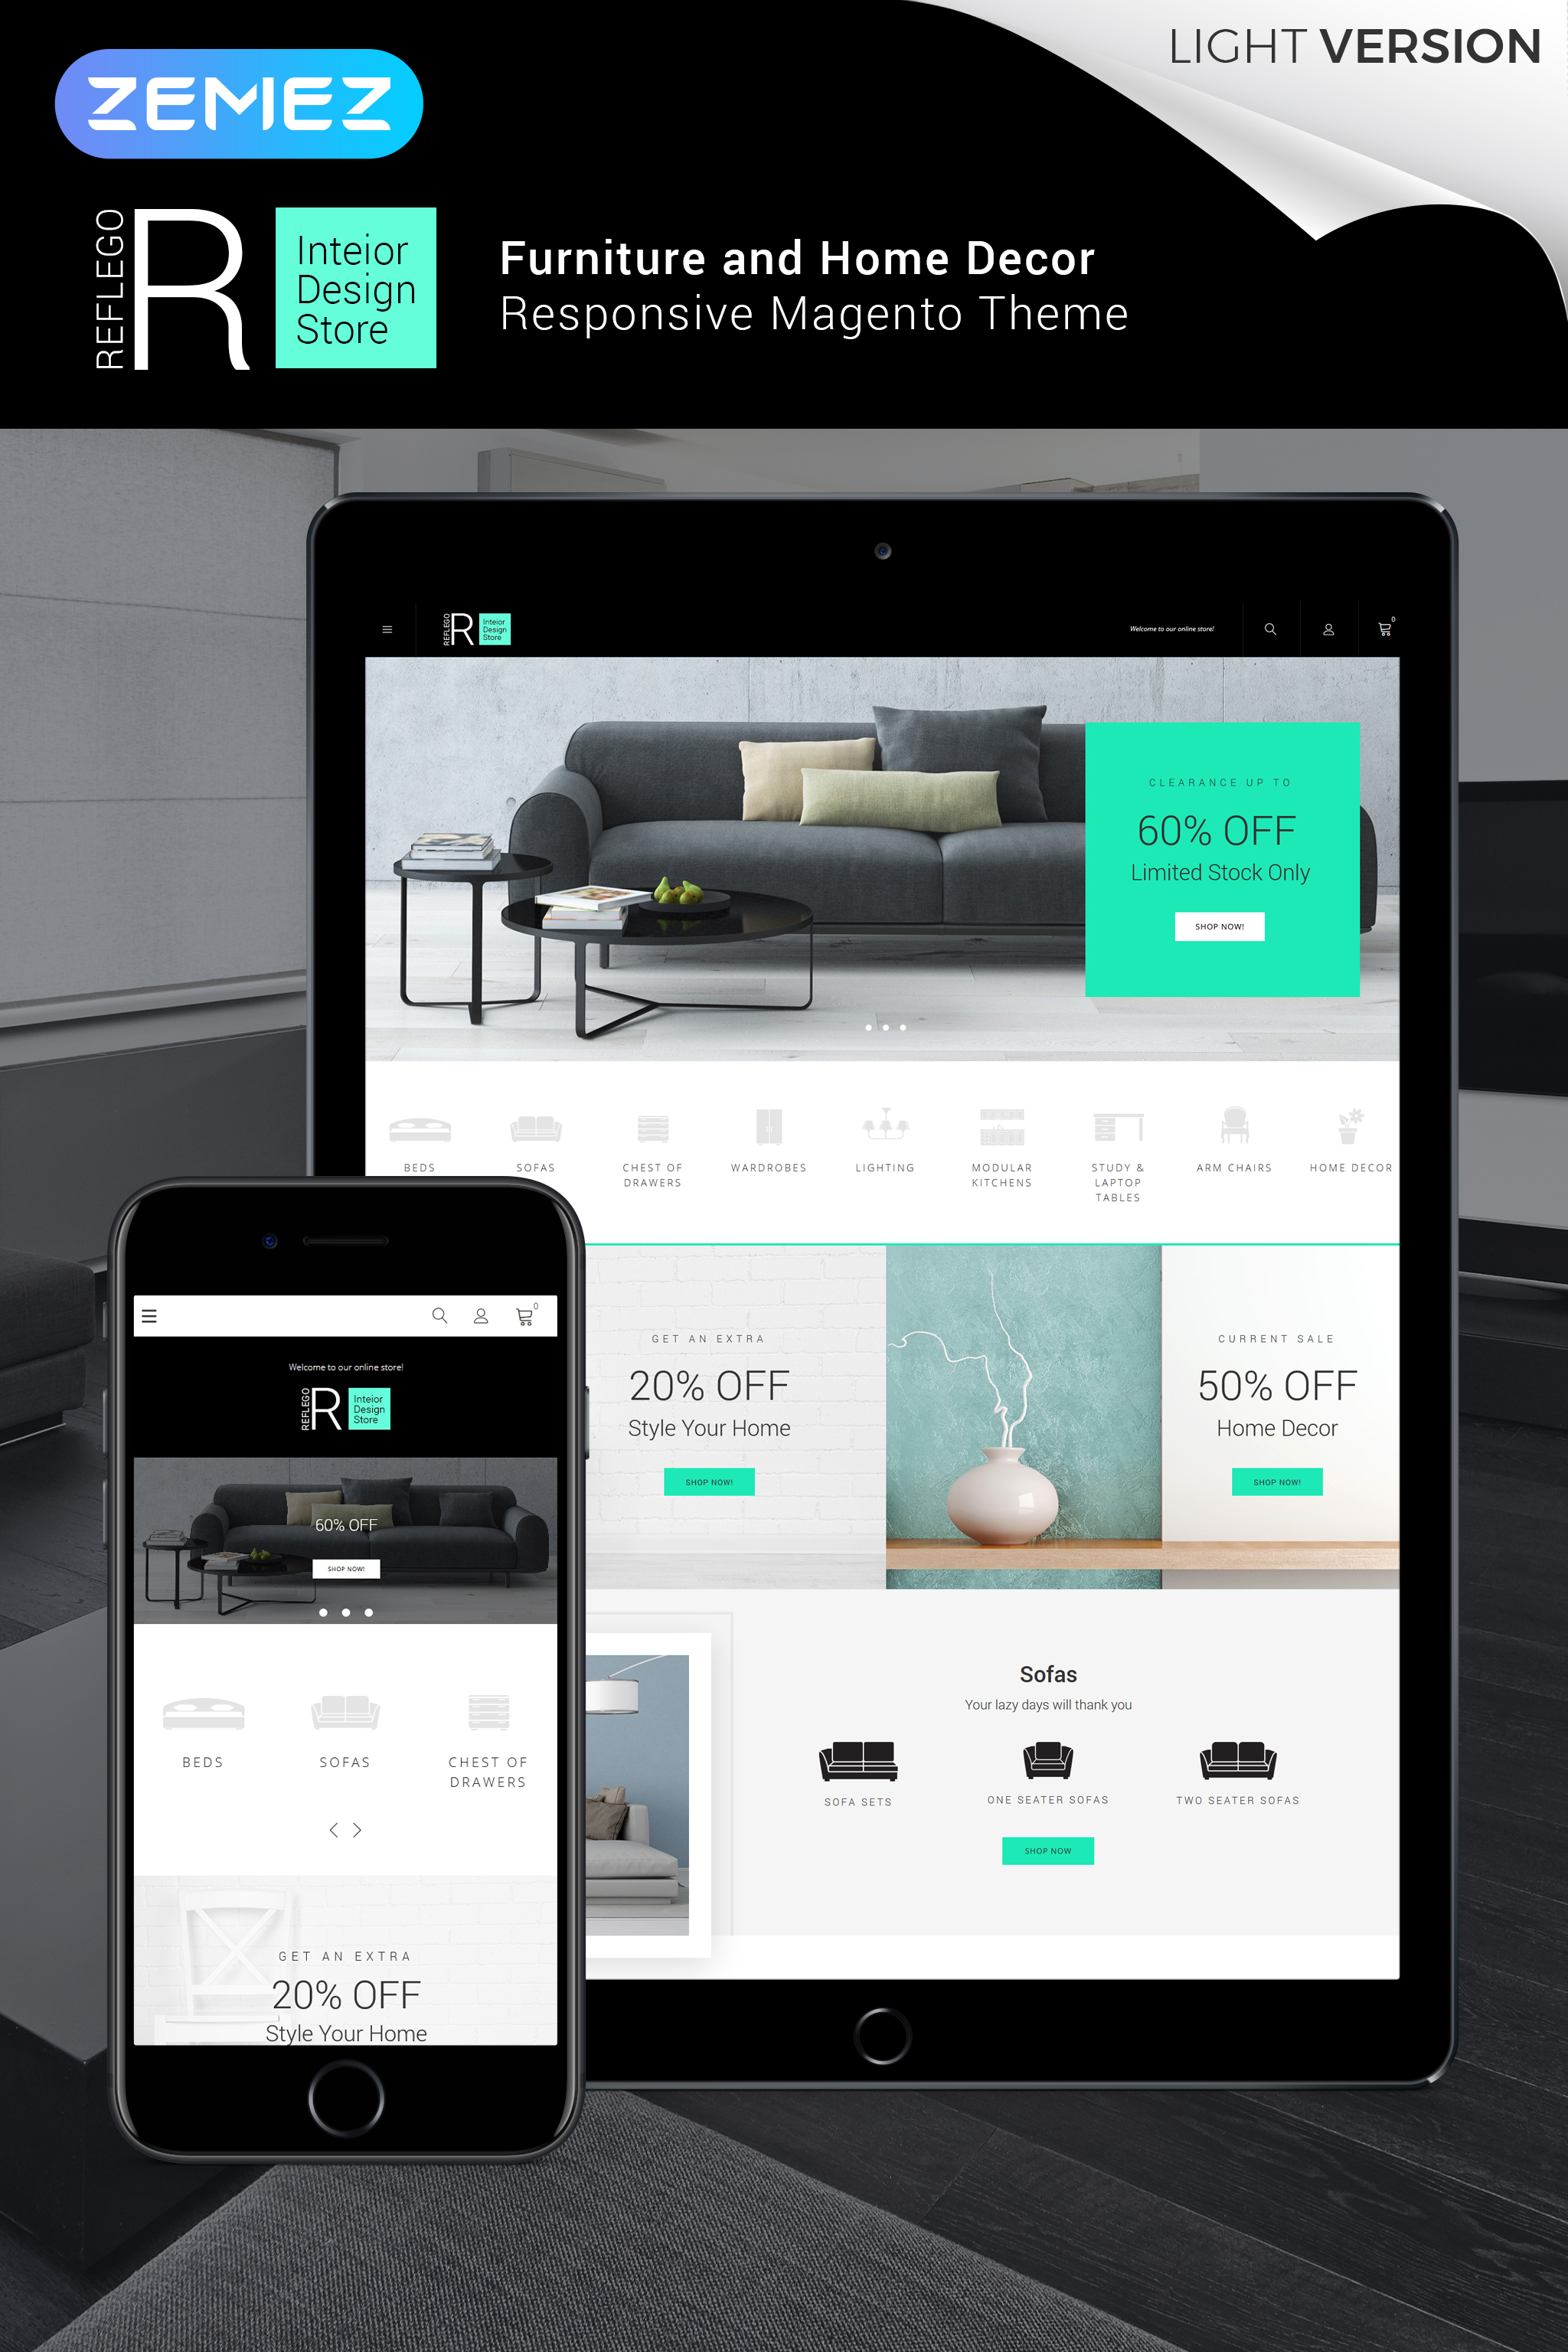 Reflego - Furniture & Home Decor №64138